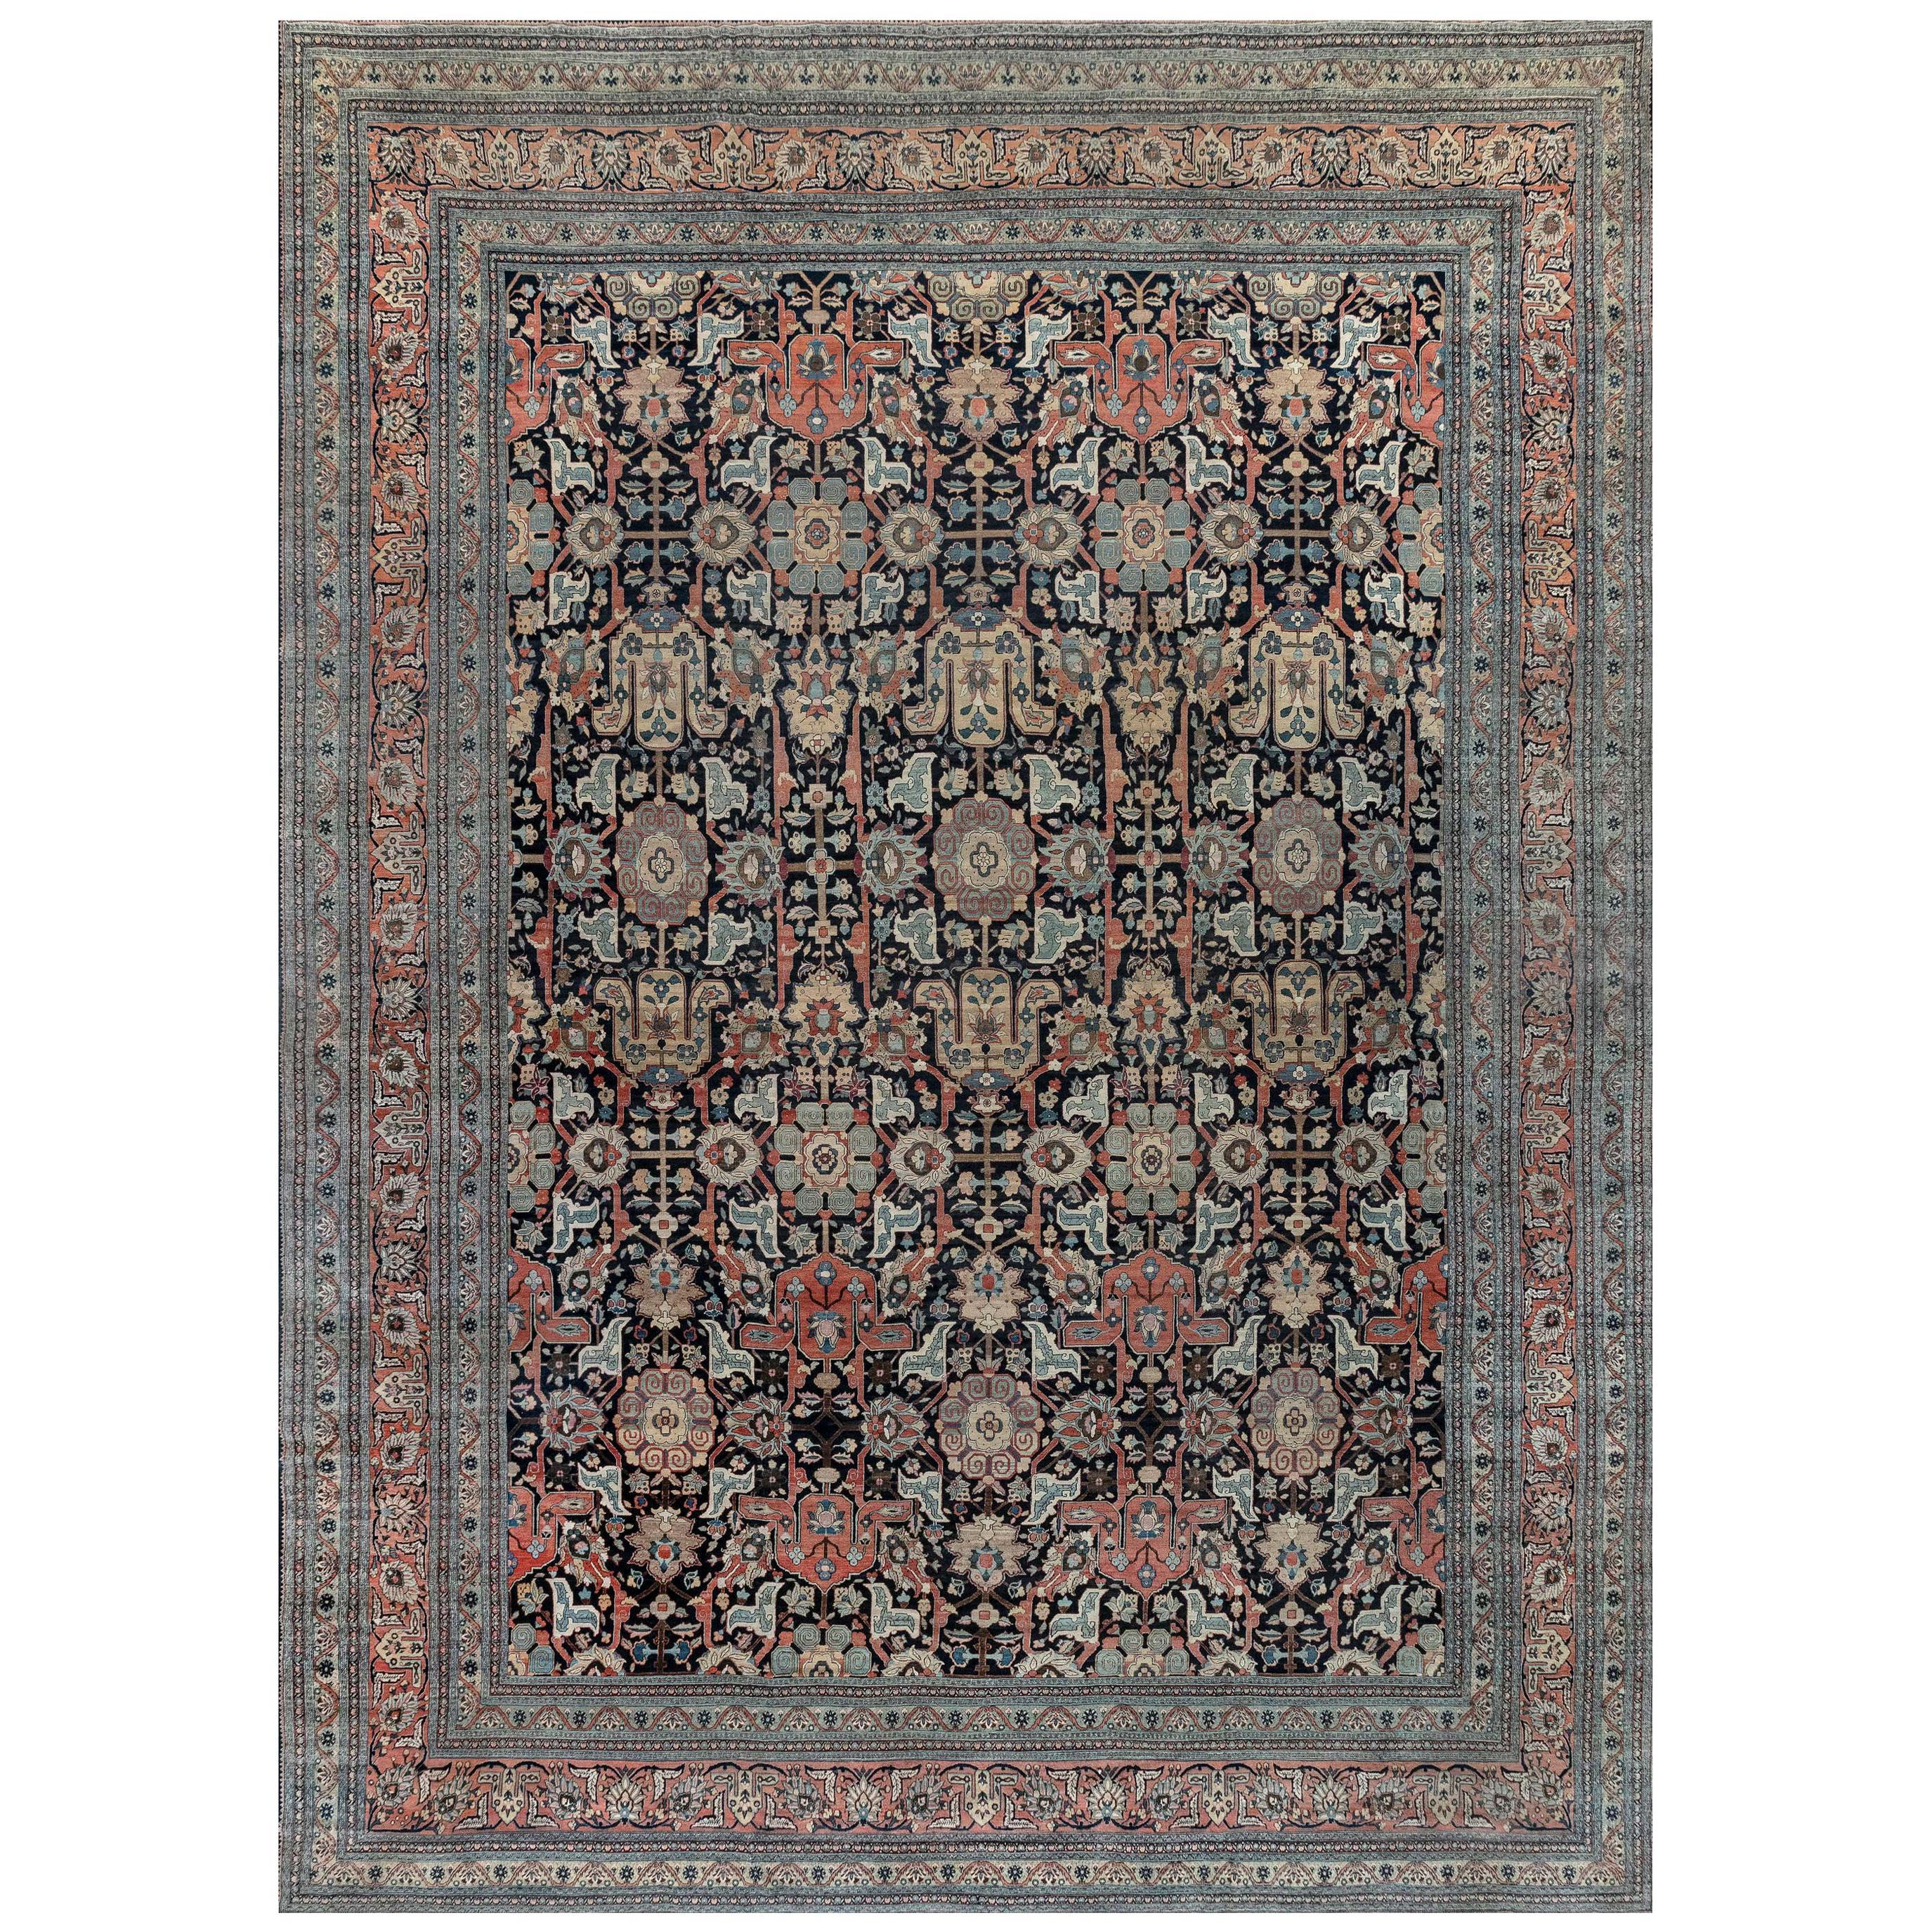 19th Century Persian Tabriz Handwoven Wool Rug